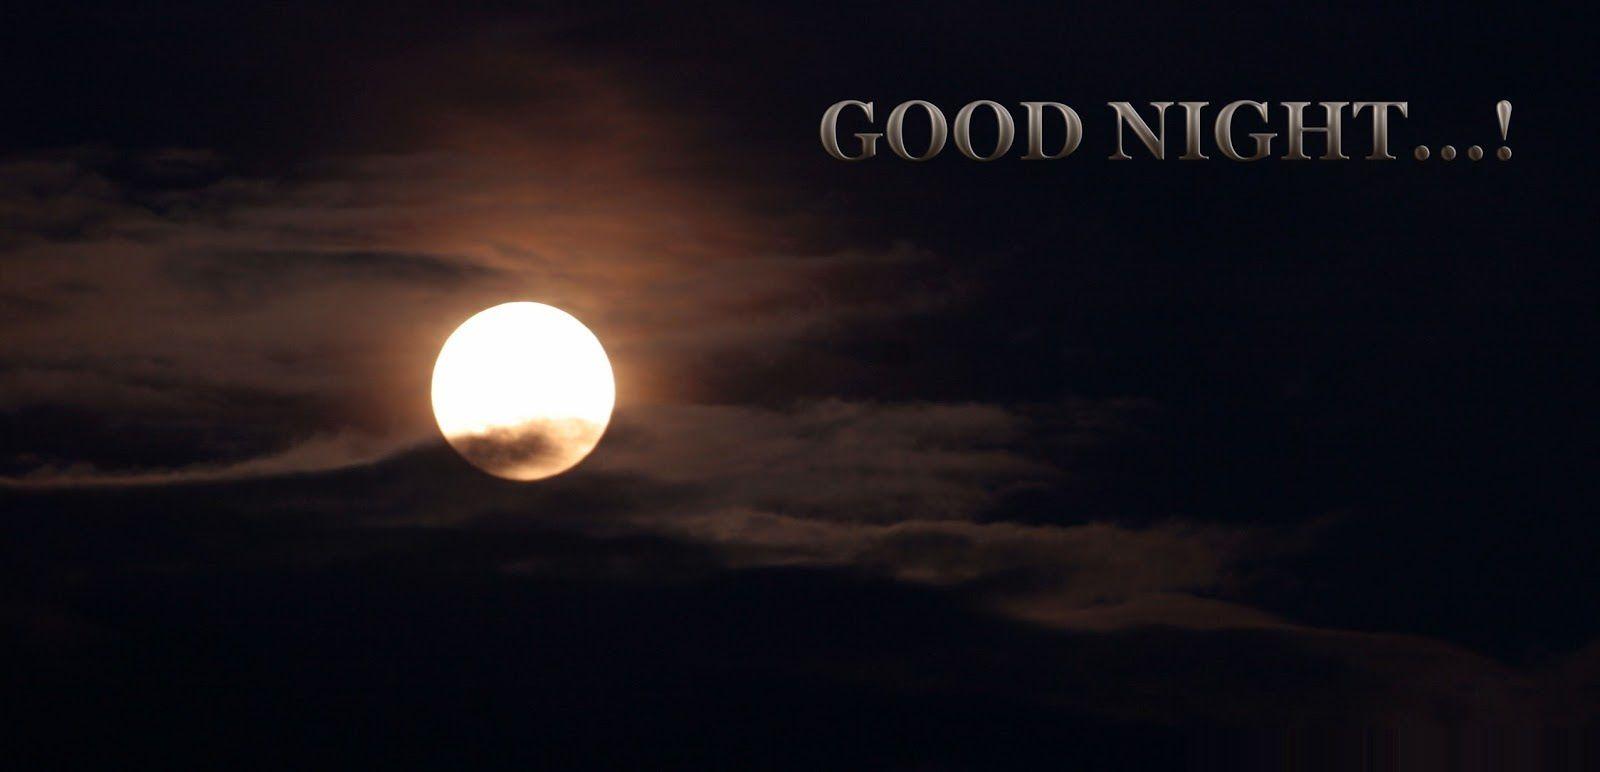 Good Night - Lune - Nuit - Wallpaper - Free